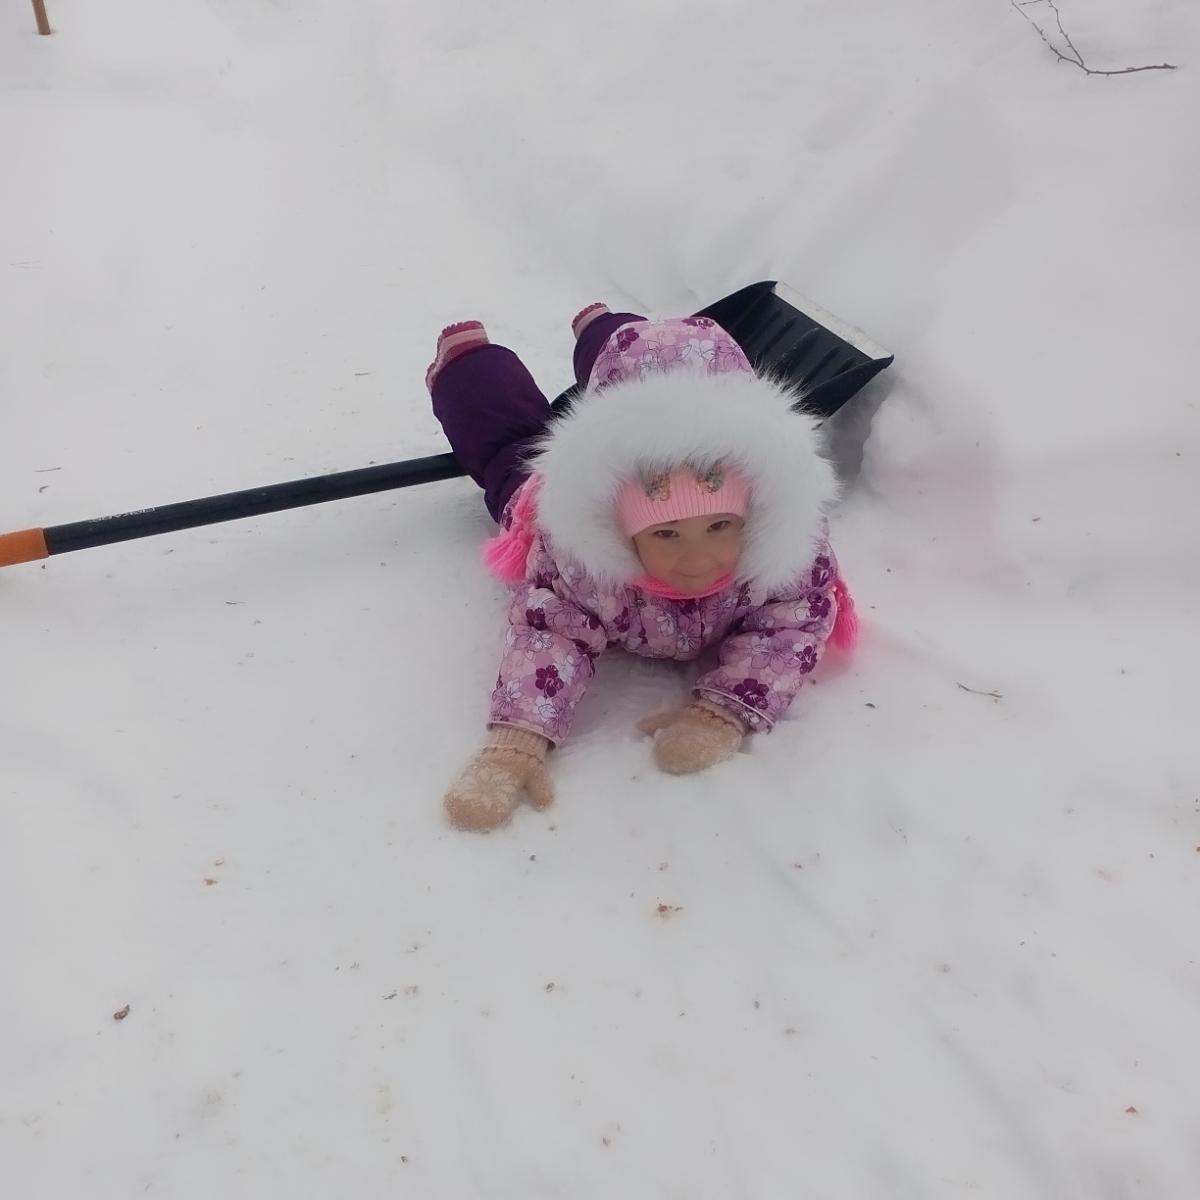 Чистим снег, как можем). Наши дошколята